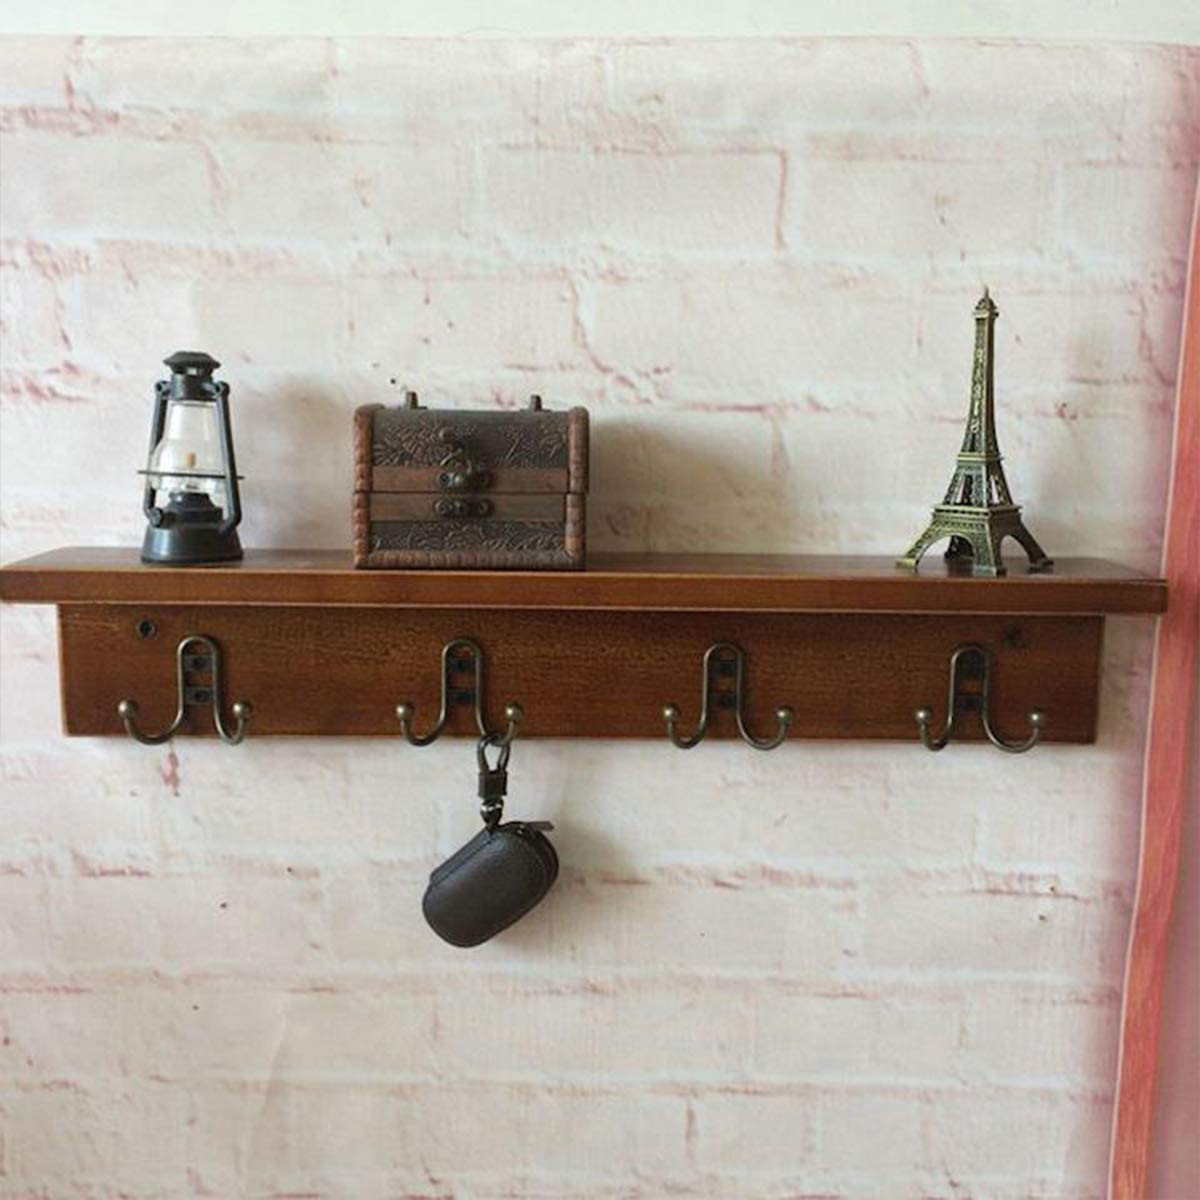 Warm Van Vintage Metal Wall Mounted Coat Hooks,Floating Closet Storage Rack,Retro Home Entryway Hanging Shelves,New Zealand Pine Wood Partition Shelf,Double Hook Hangers